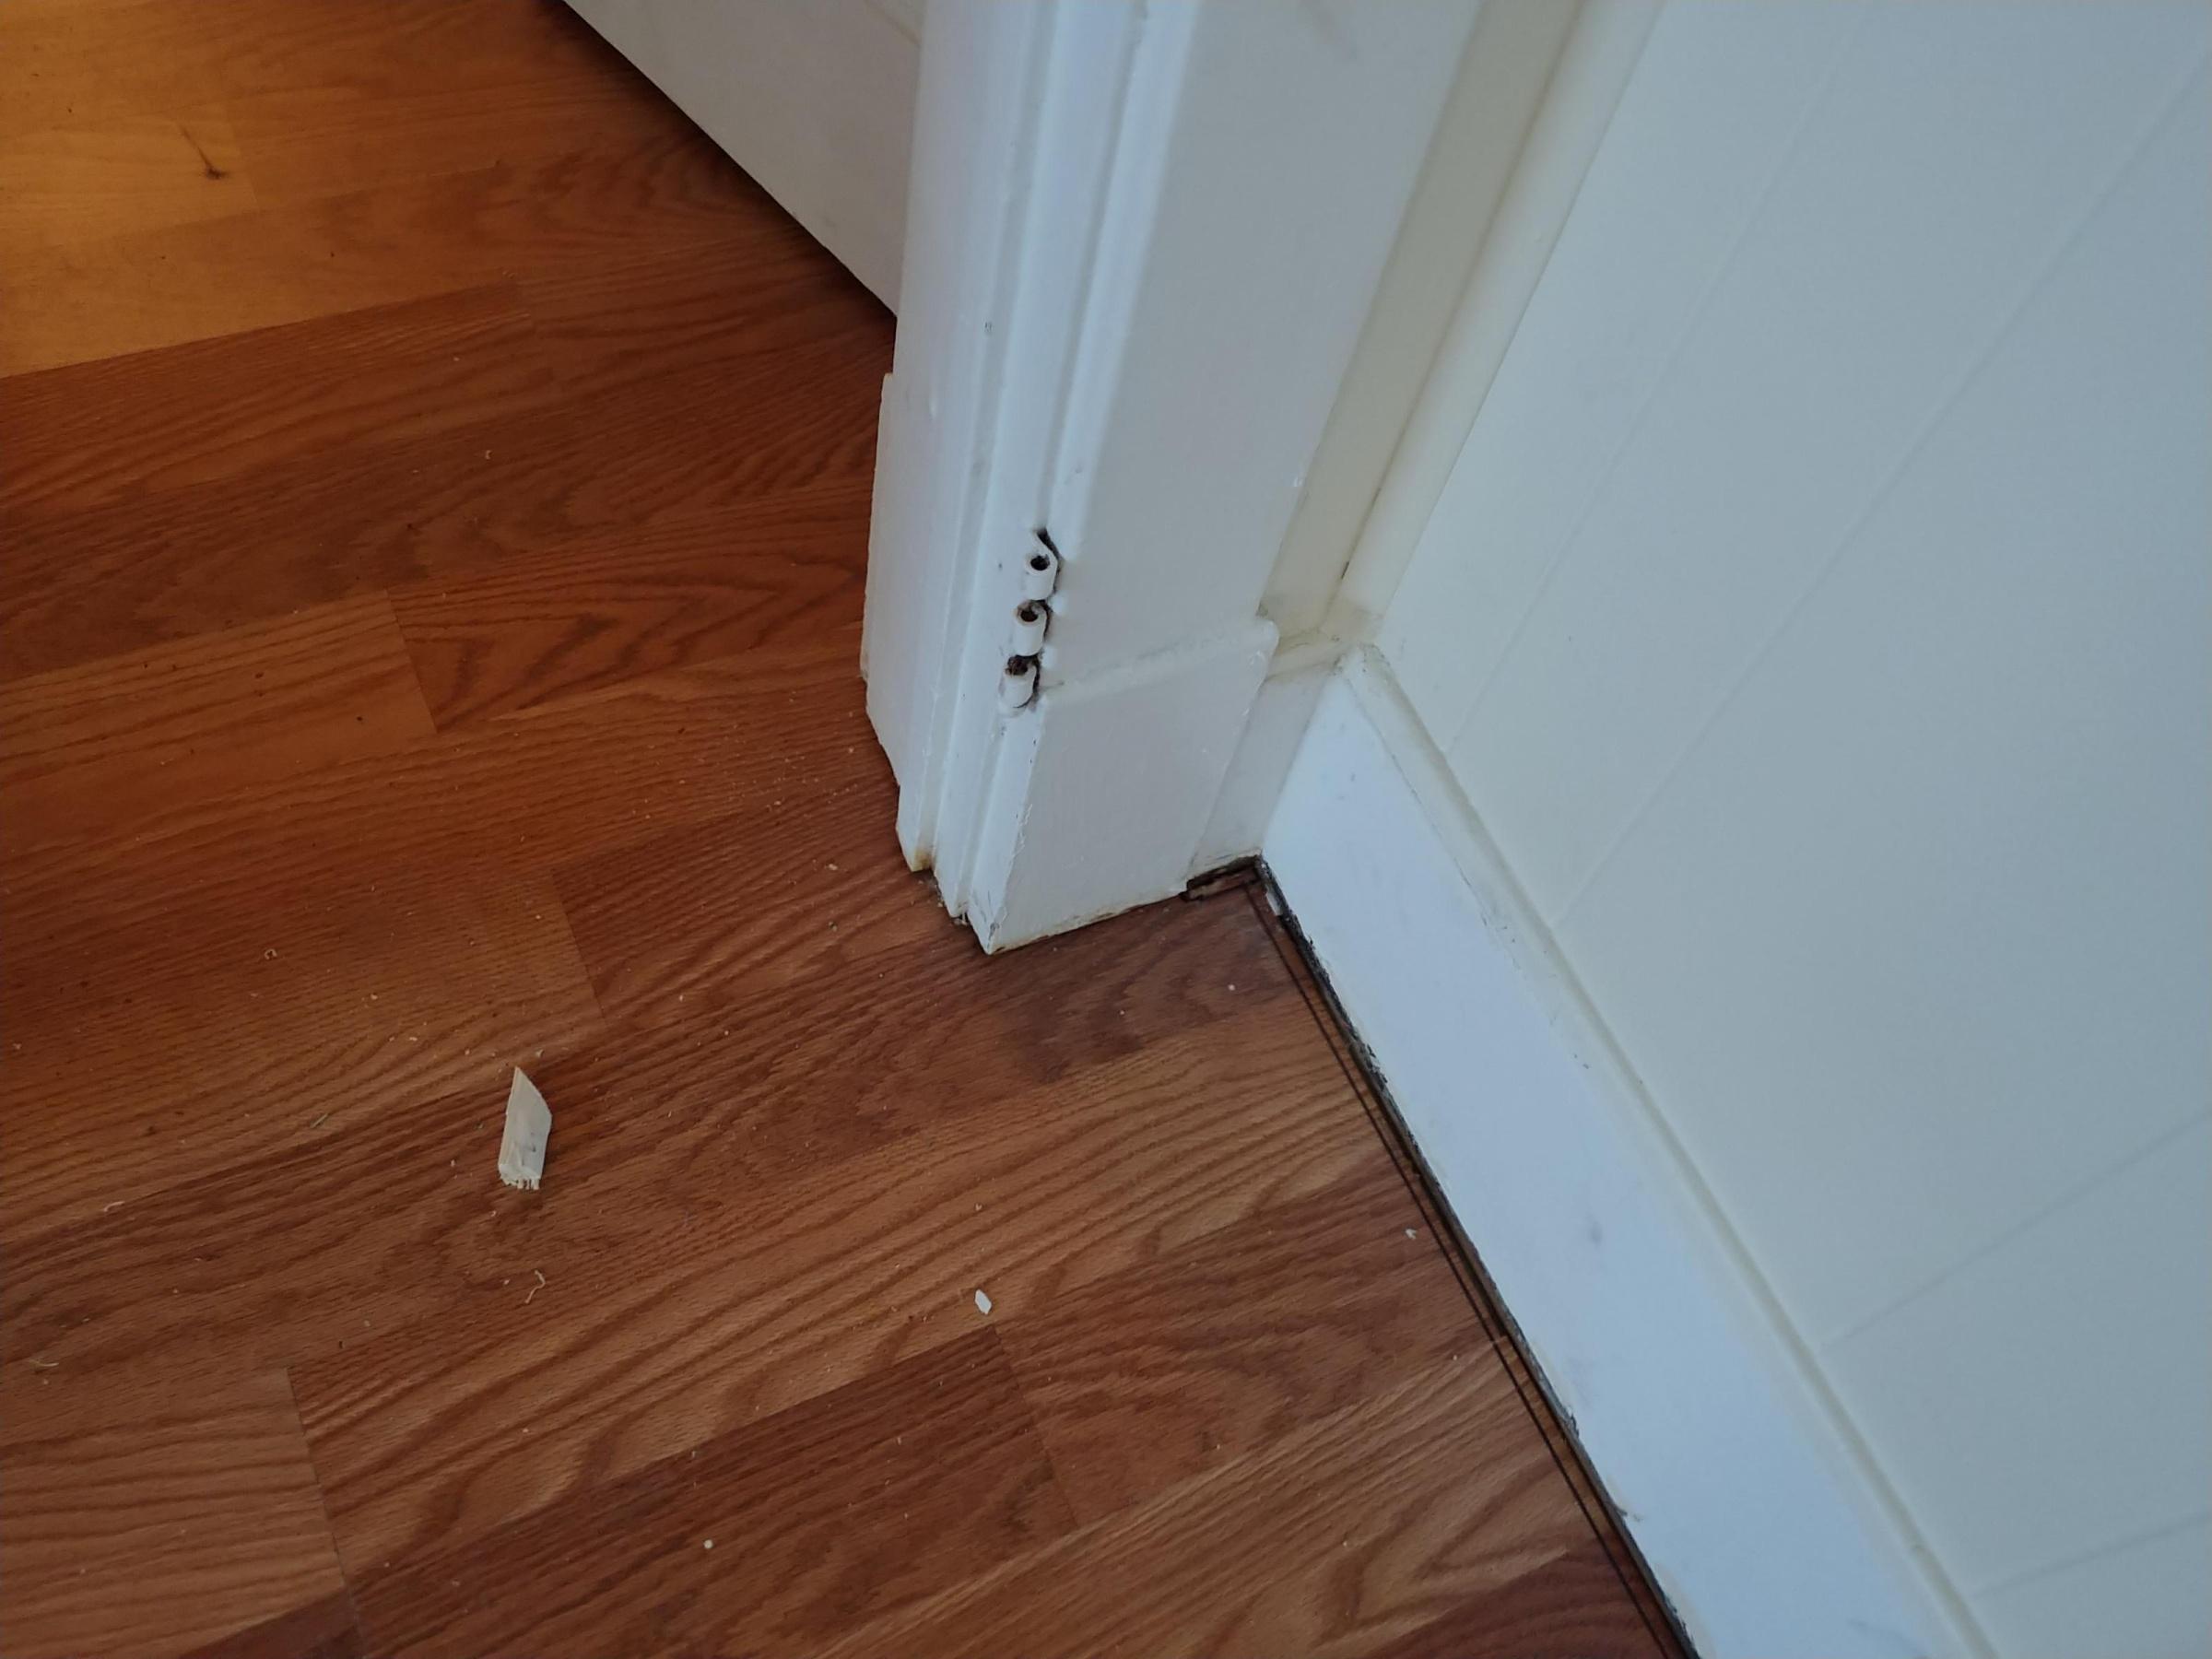 Leave Gap Between Quarter Round And Laminate Flooring Diy